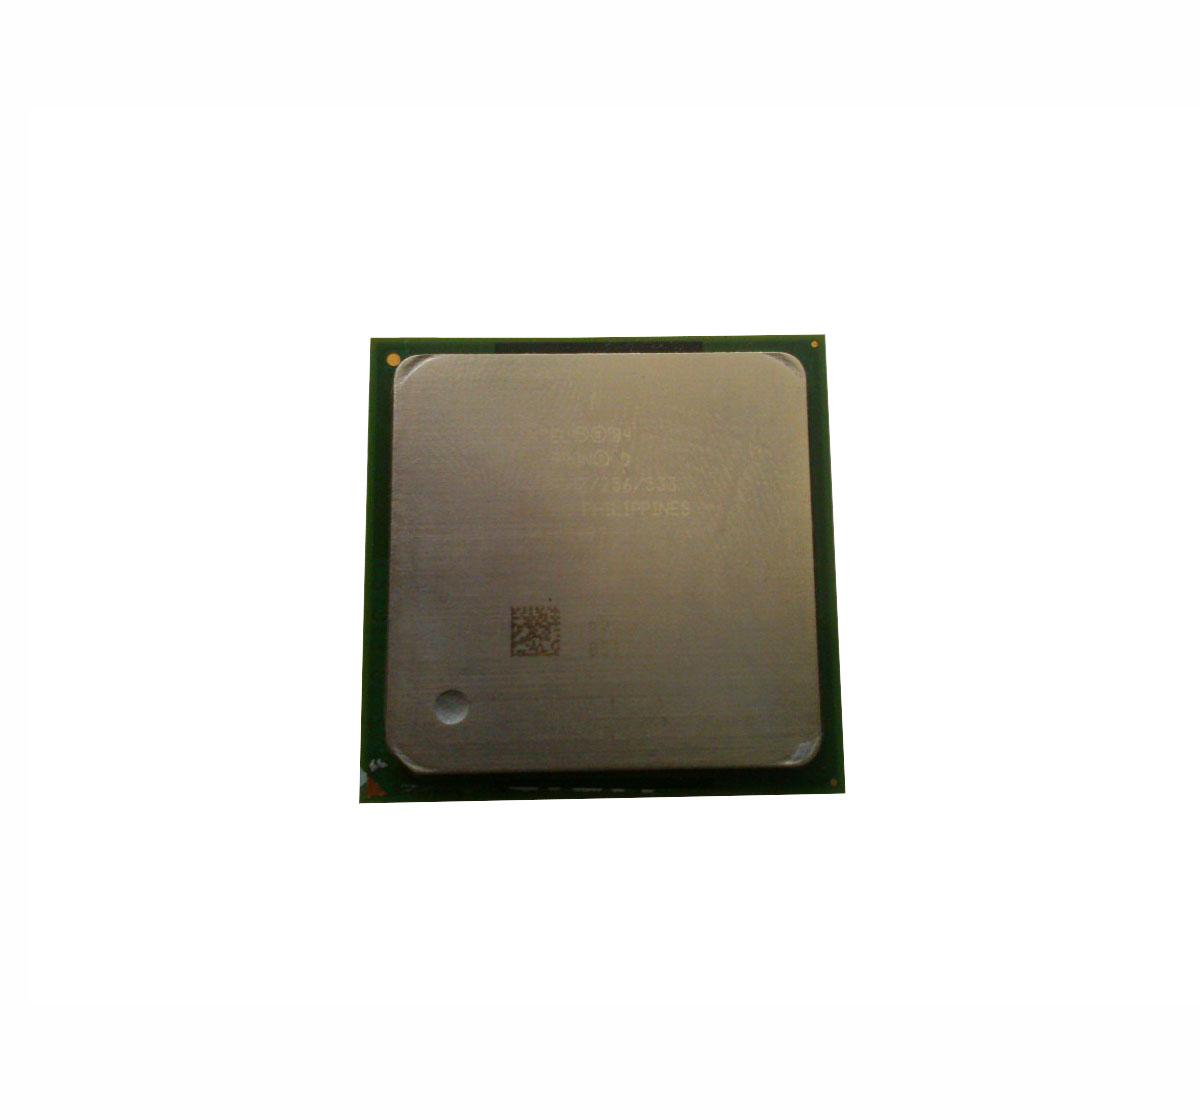 Processador Intel Celerom D 2.40Ghz SL87J 478